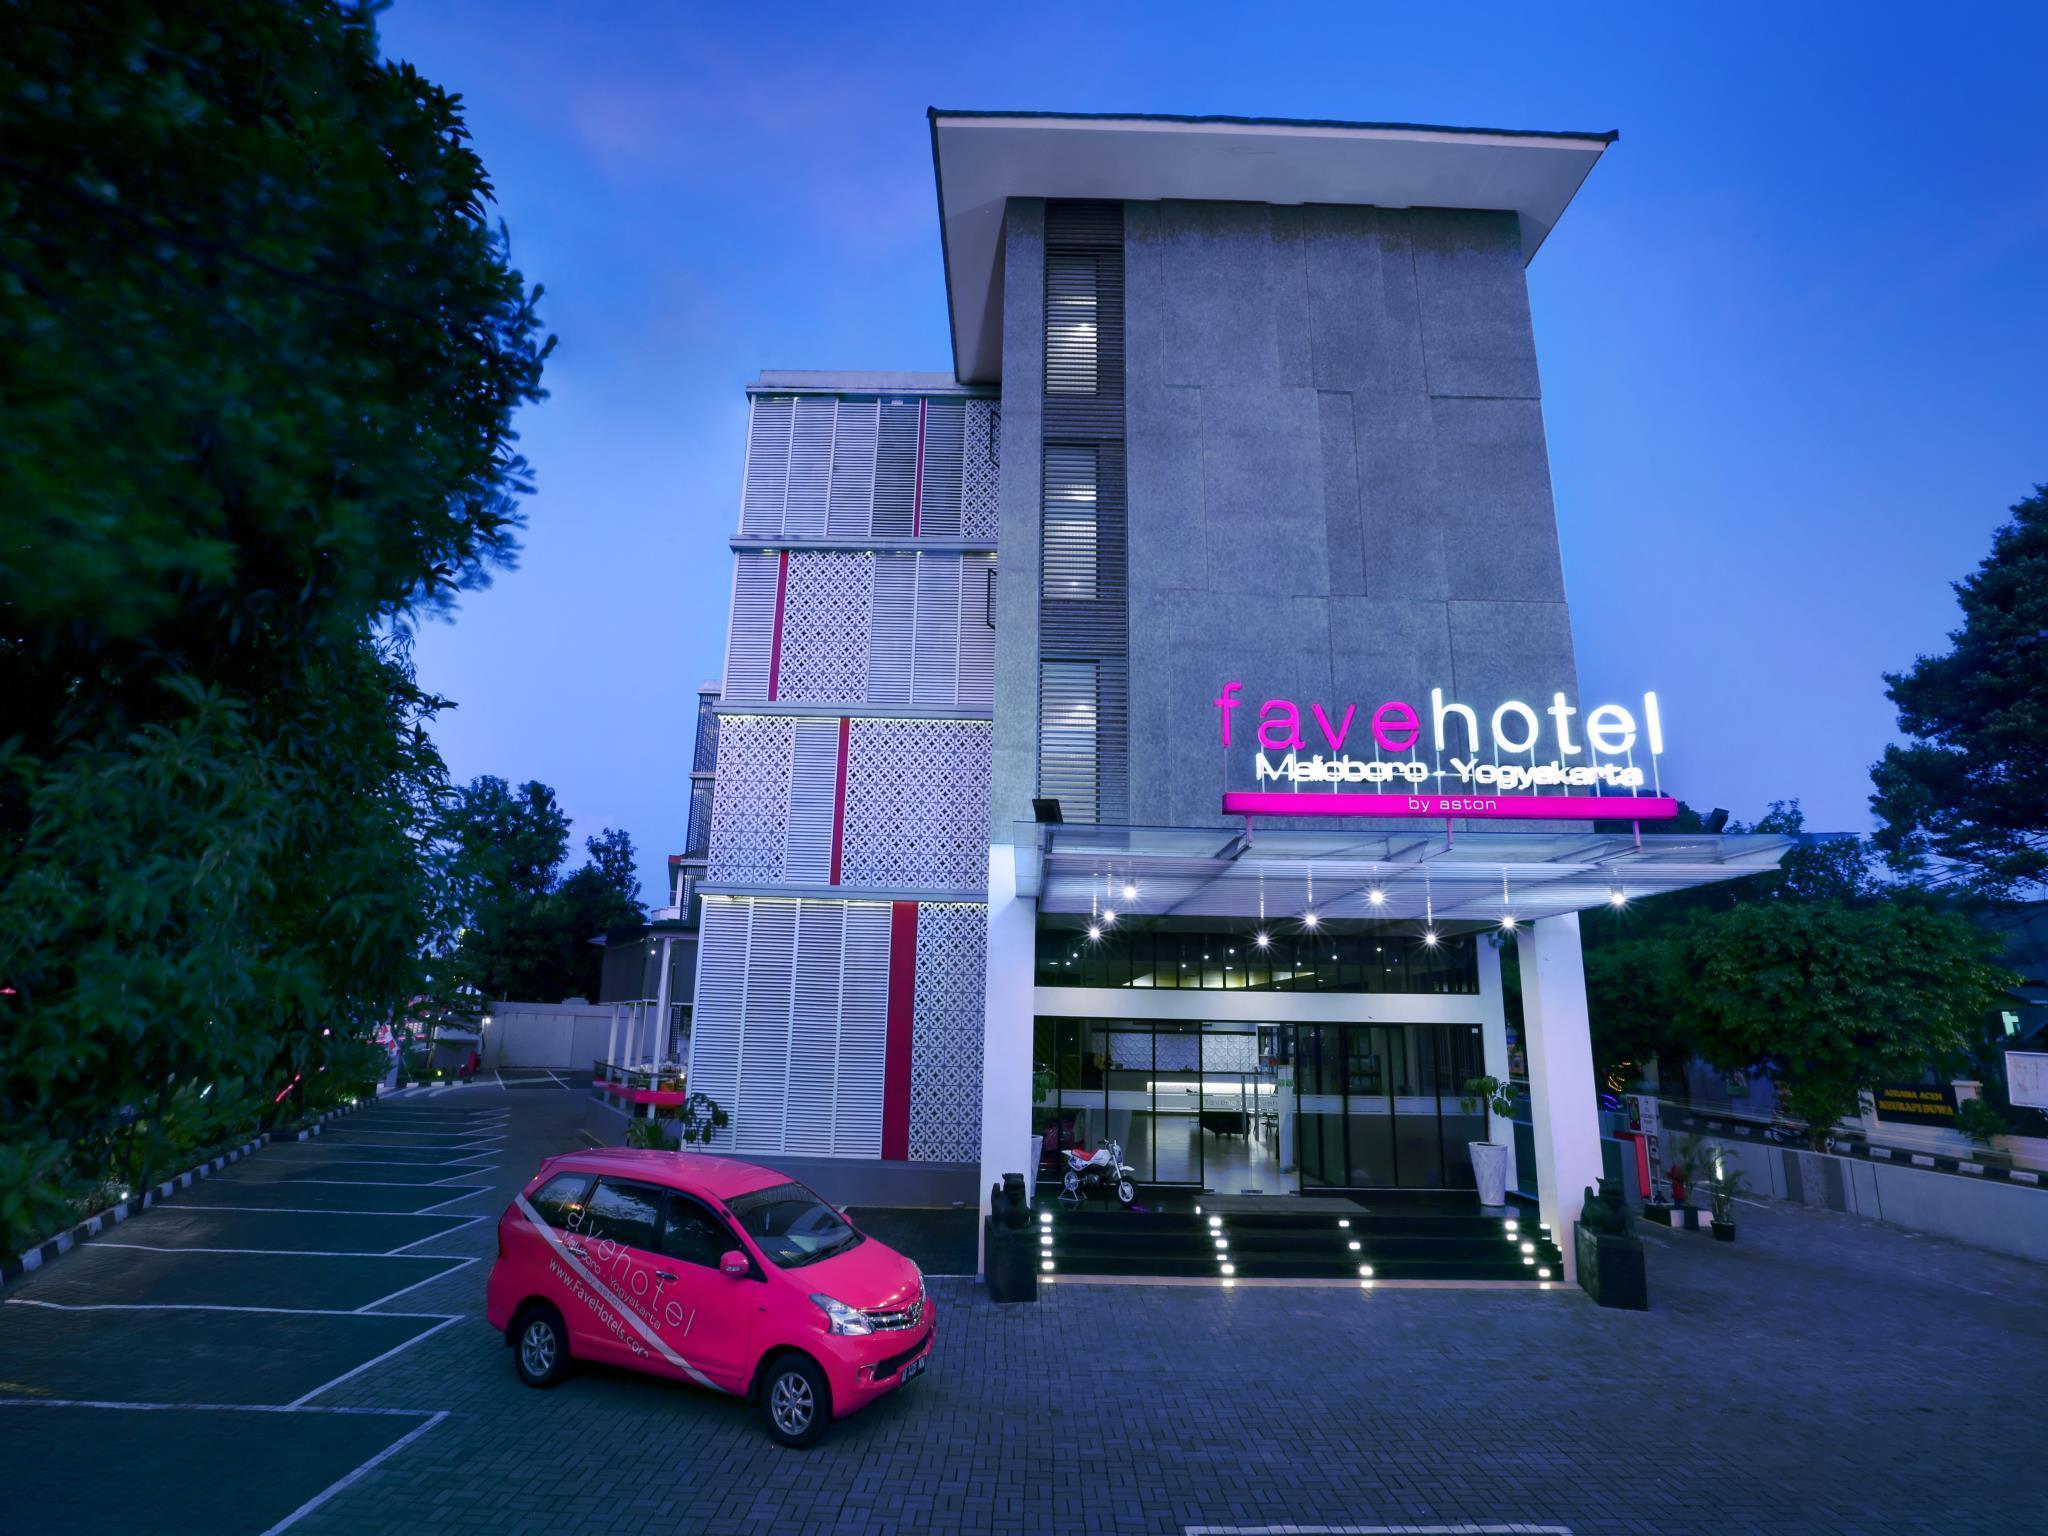 Favehotel Malioboro Yogyakarta (Formerly Favehotel Kotabaru Yogyakarta)